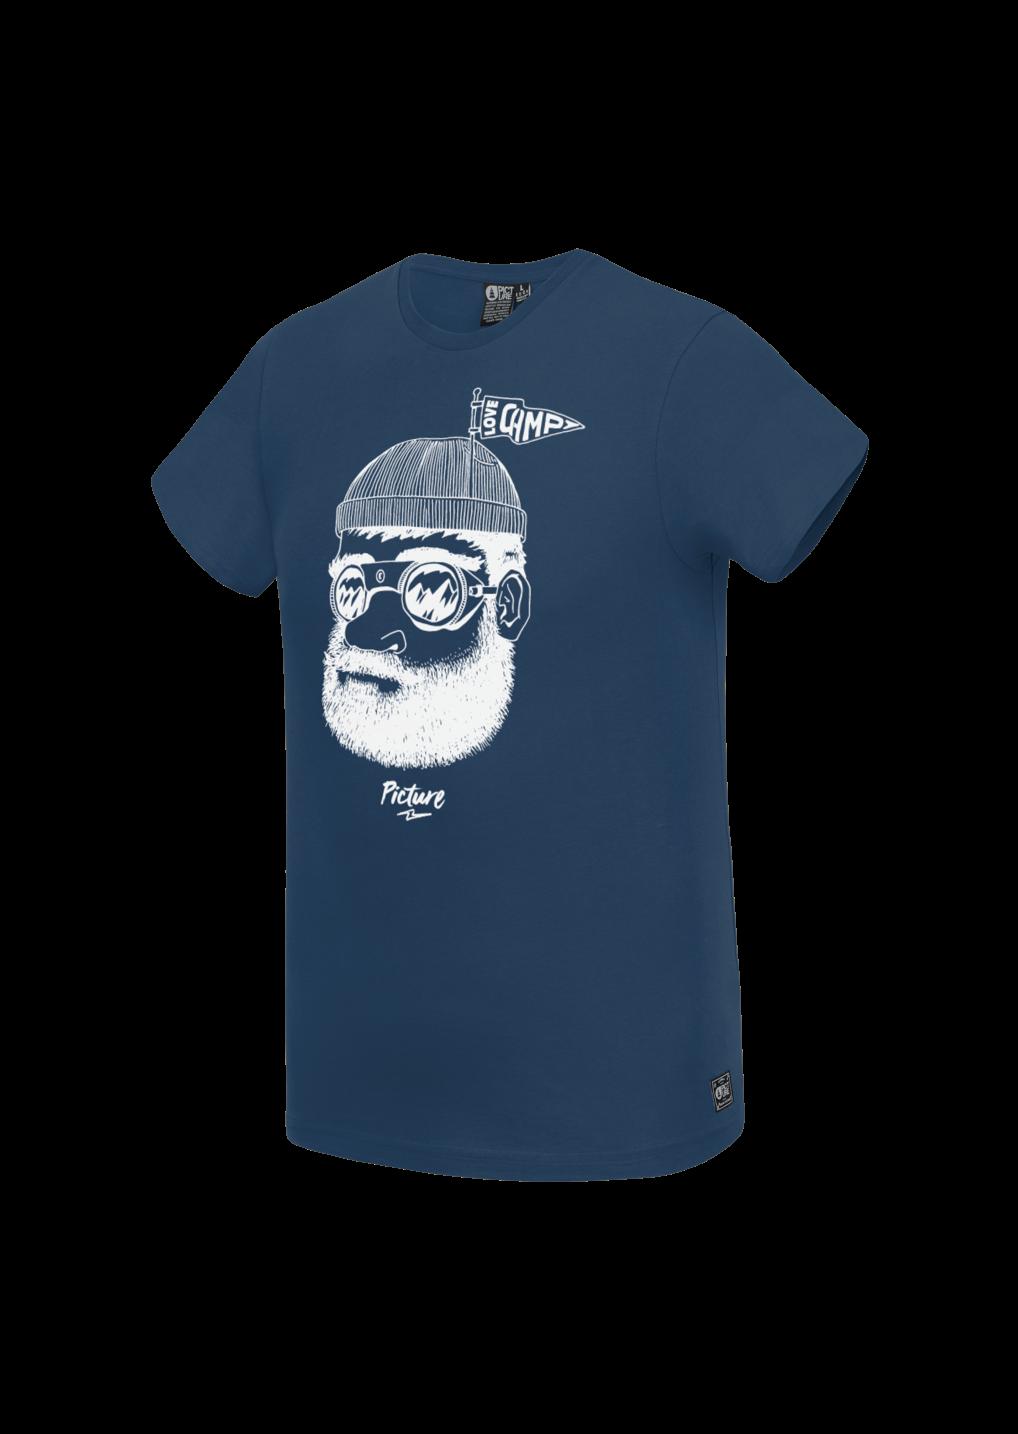 Tee Shirt Picture Pinecliff Dark Blue